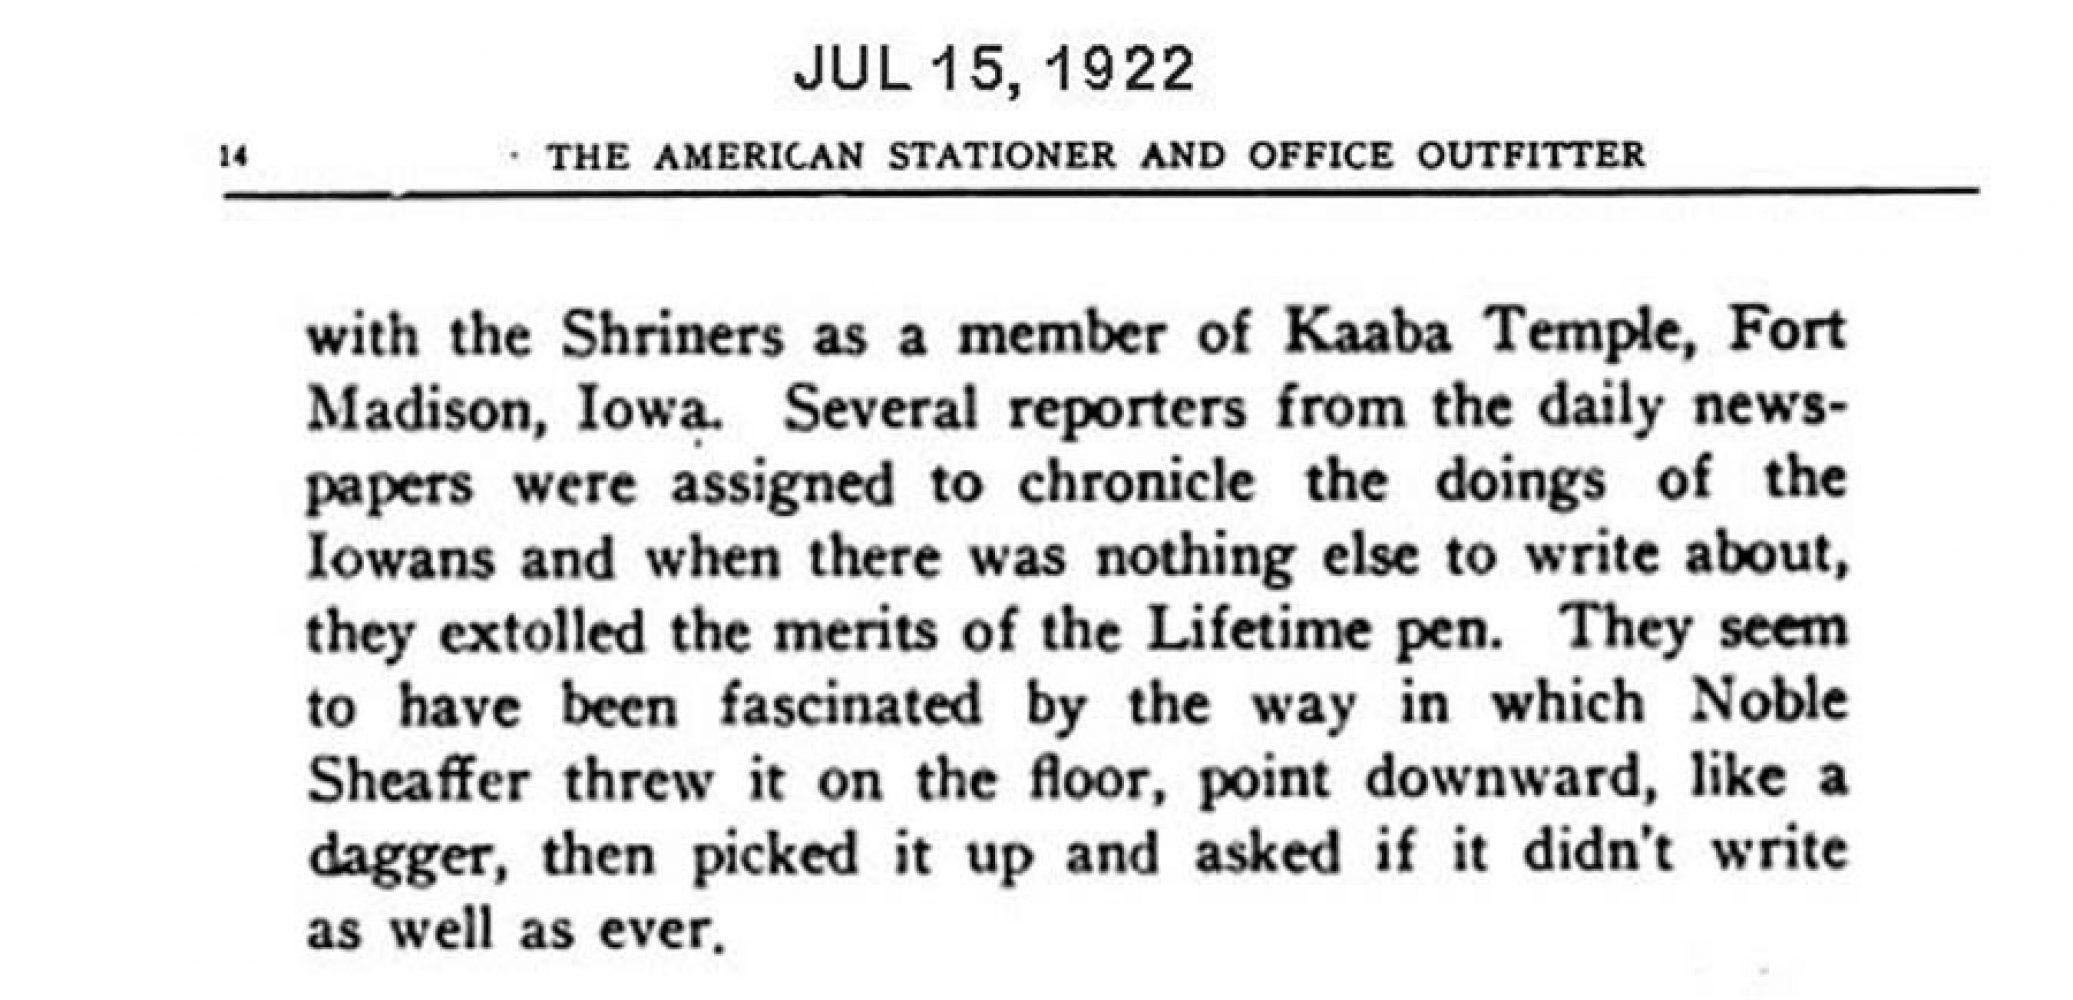 1922 07 15 caseín Noble SheafferS Lazard